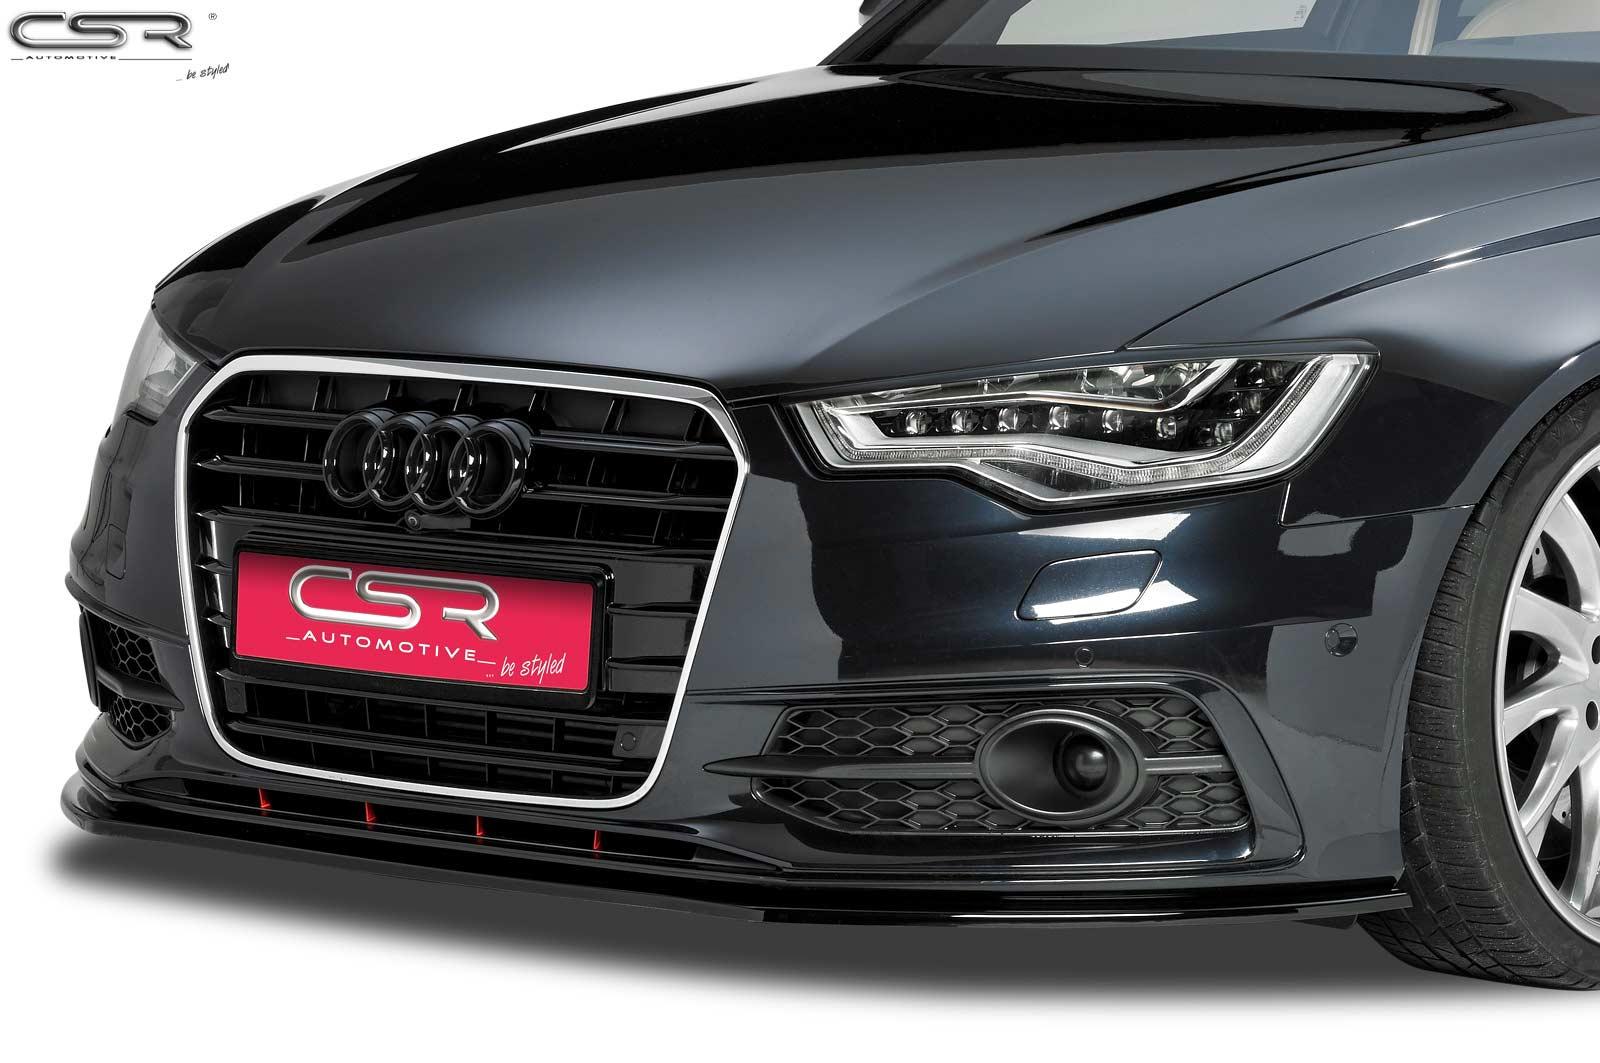 Cupspoilerlippe Glossy für Audi A6 C7 S-Line CSL163-G